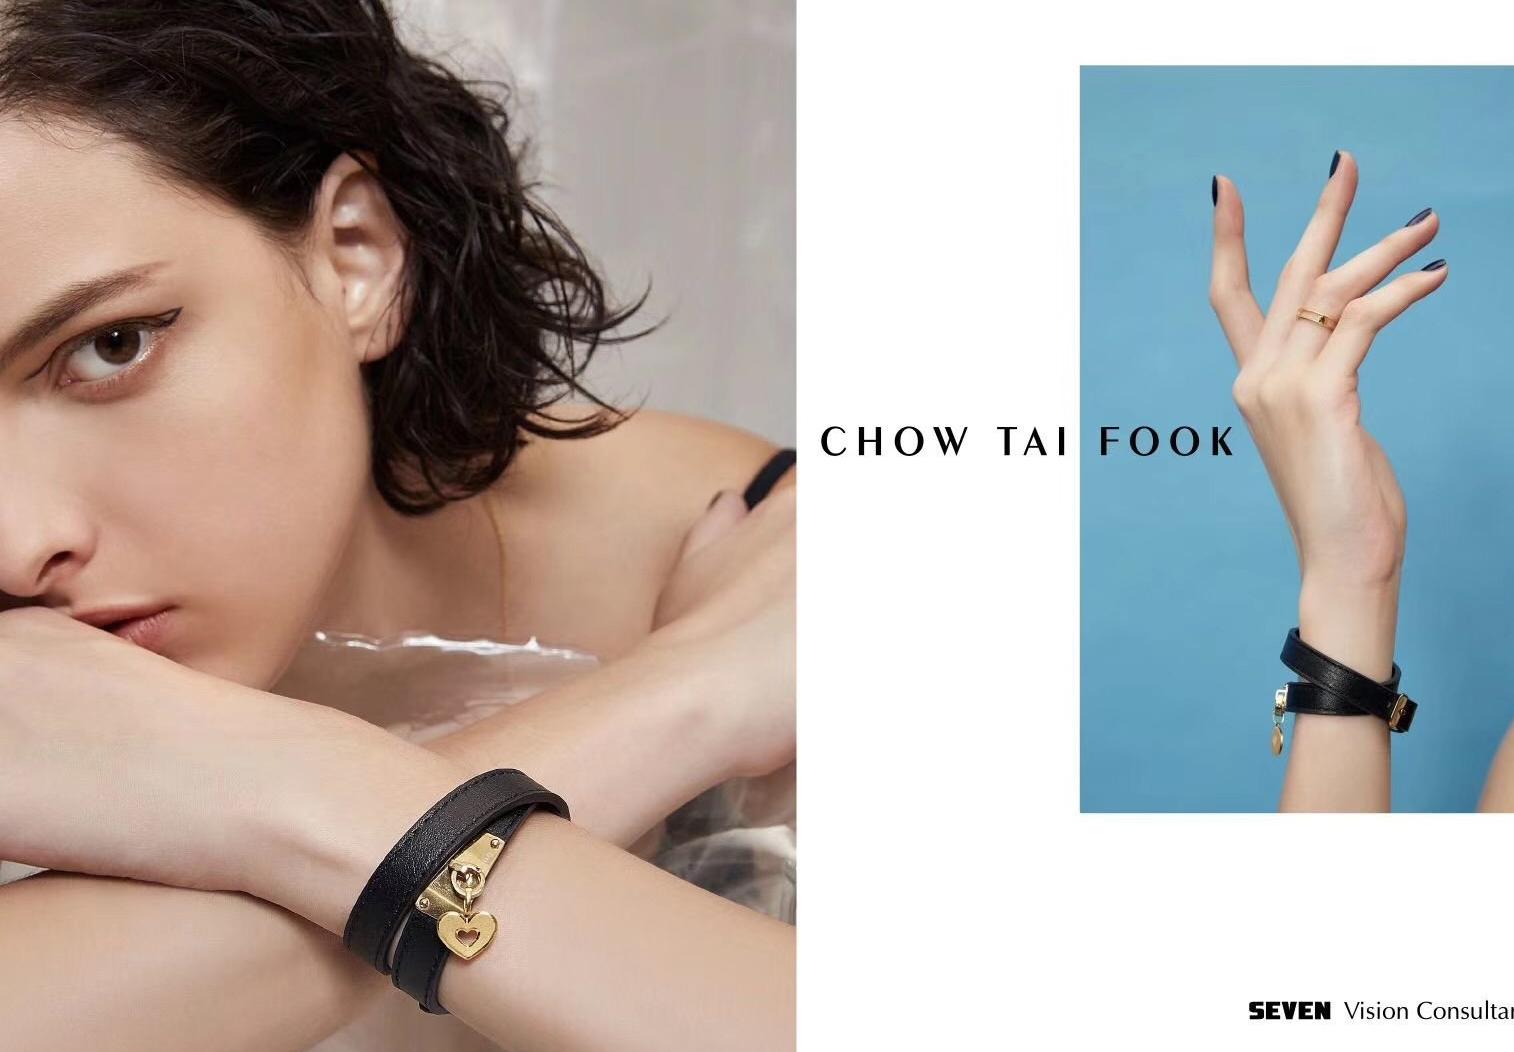 珠宝摄影 | 周大福 Chow Tai Fook